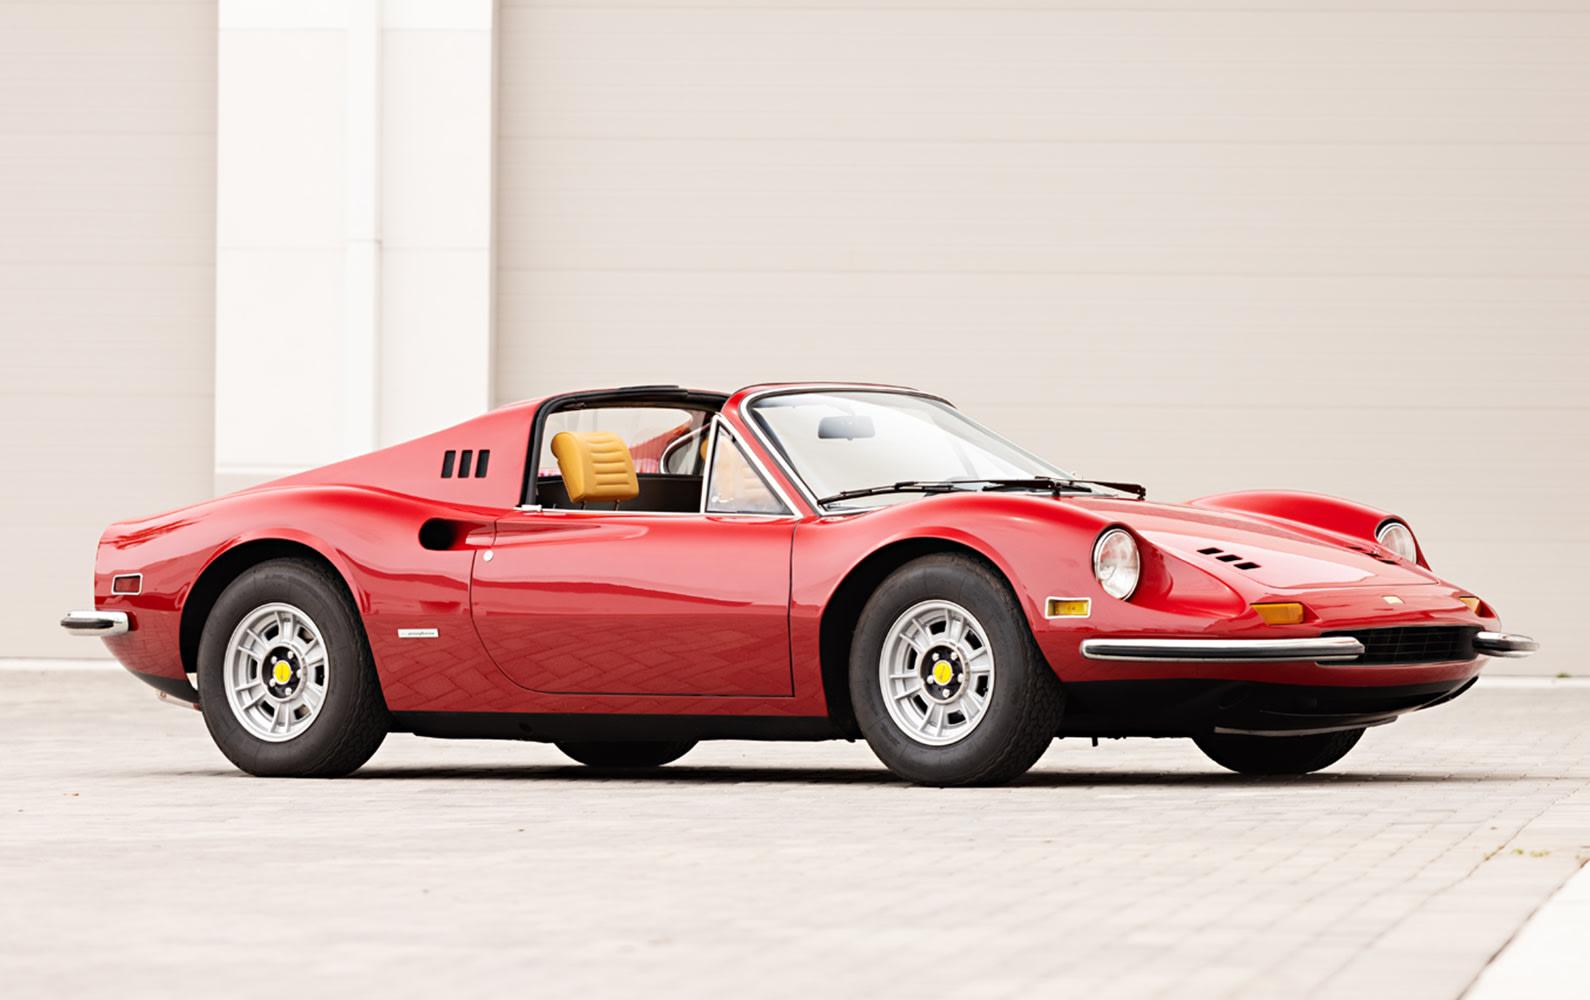 1973 Ferrari Dino 246 GTS (2)